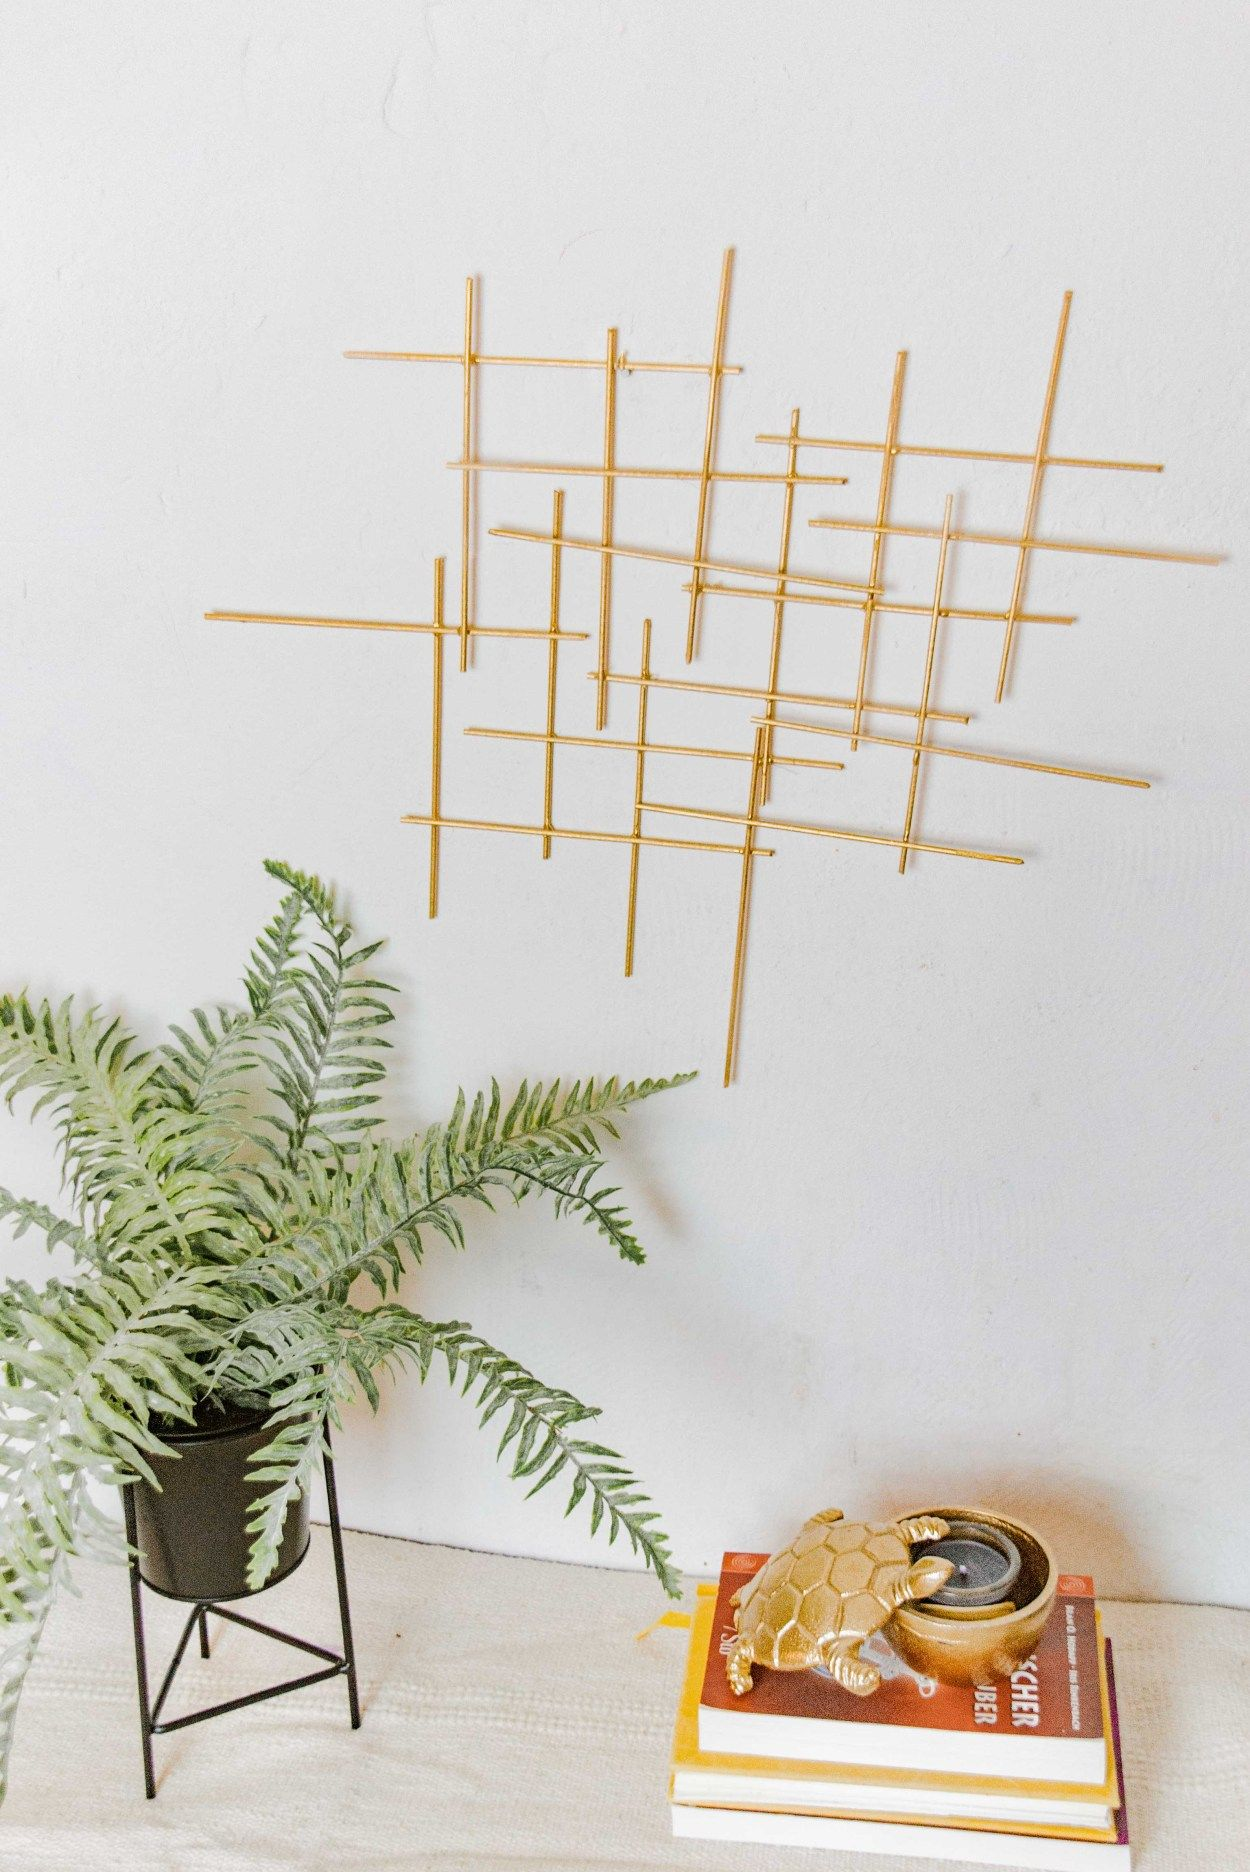 diy wanddeko in gold deko selber basteln juliatothefullest bilderrahmen selbstgemacht wanddekoration badezimmer wandobjekt metall